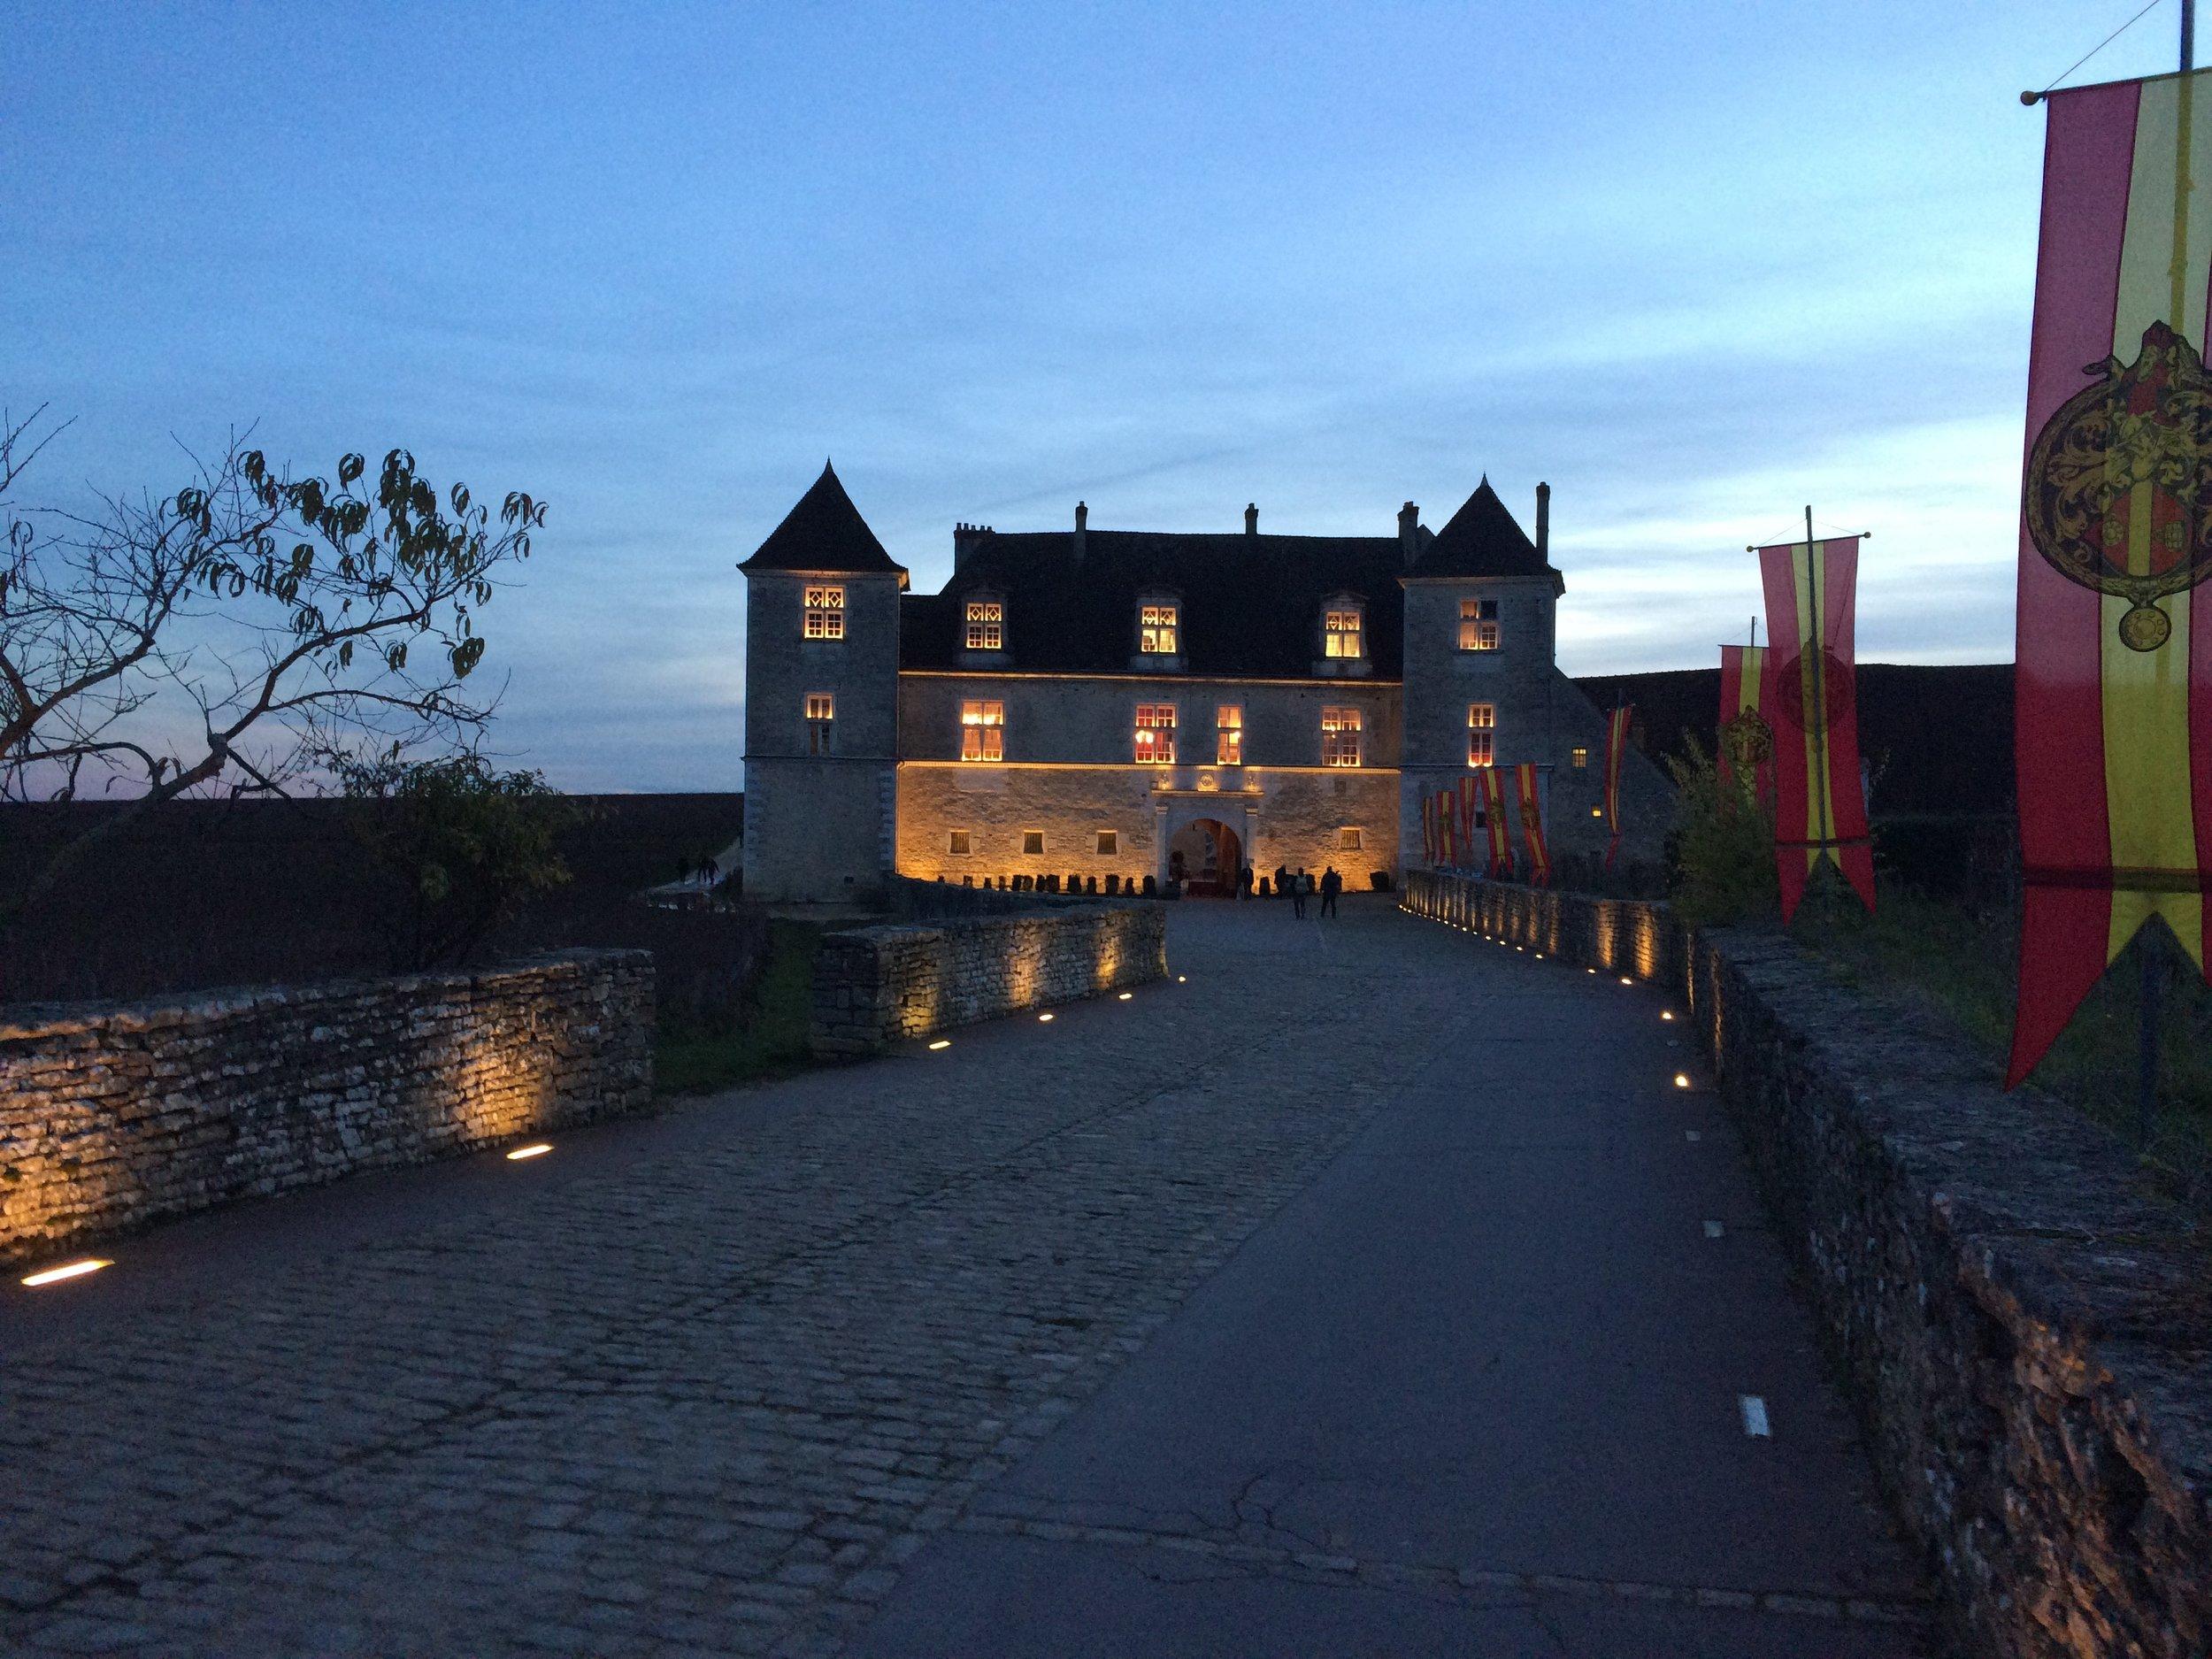 The iconic  Chateau du Clos Vougeot  - the cradle of Burgundy